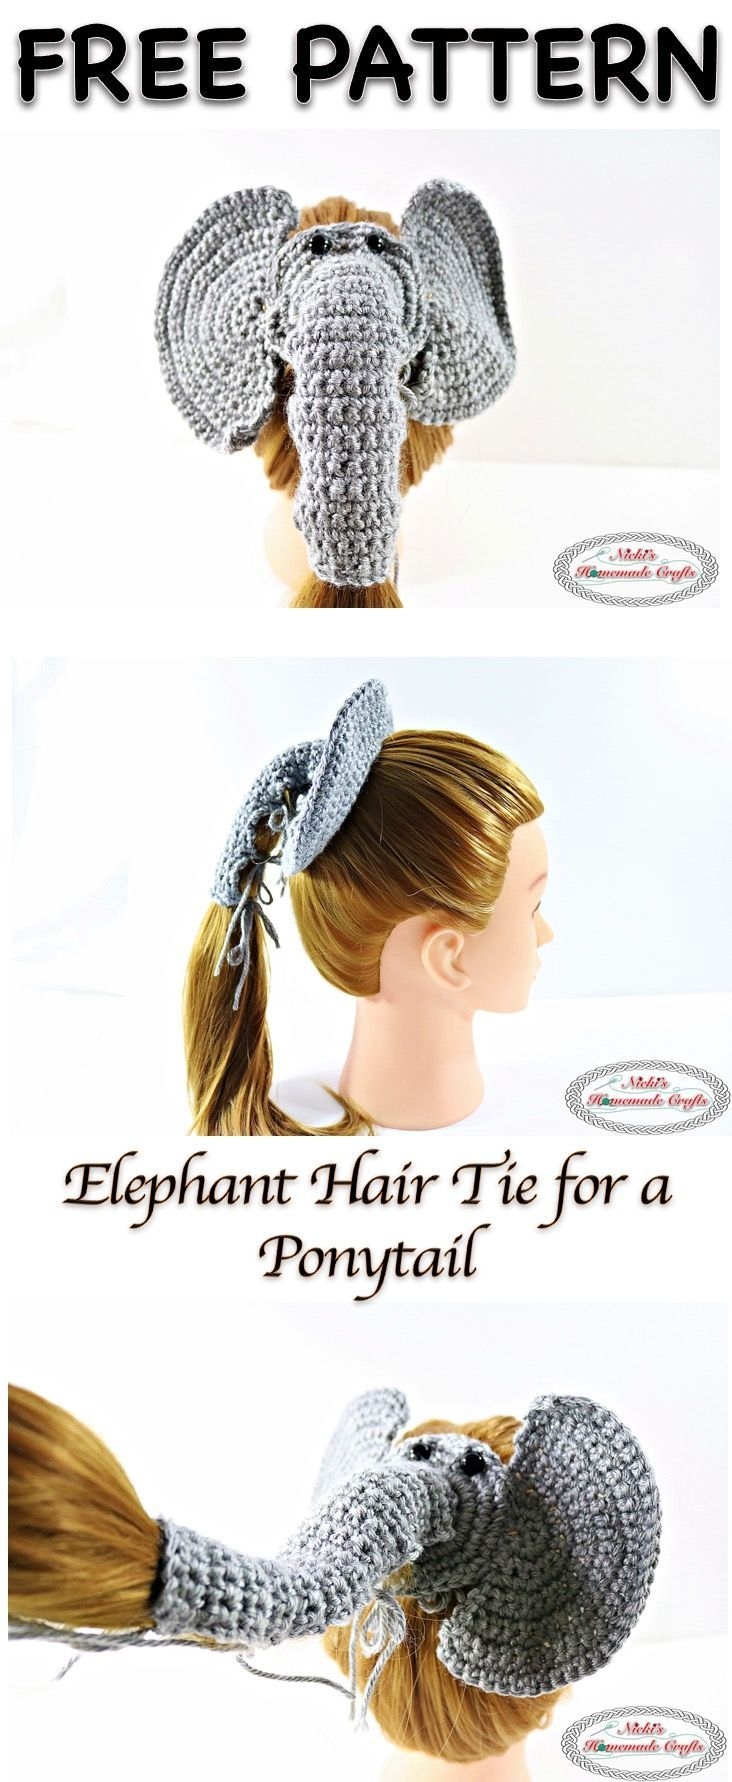 Elephant Hair tie for a Ponytail - Free Crochet Pattern   Tejido ...